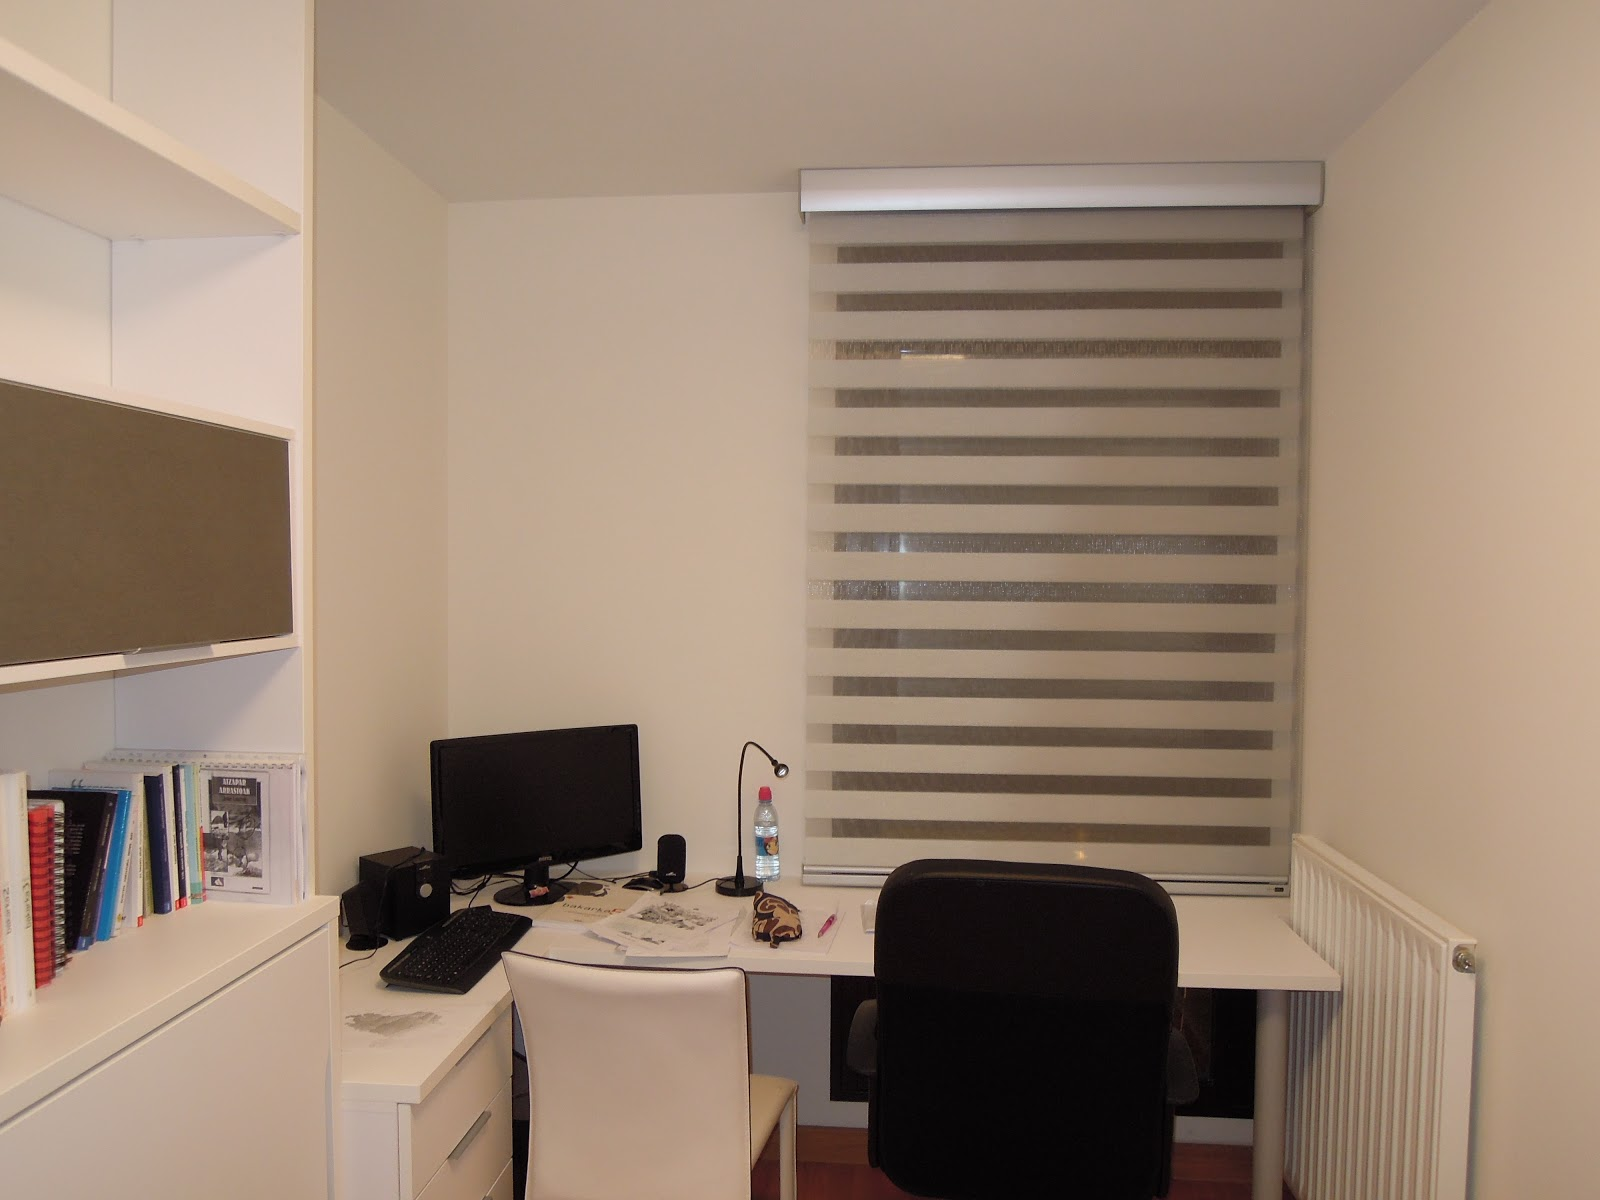 Fotos de cortinas dormitorio juvenil 2012 for Cortinas para dormitorios juveniles